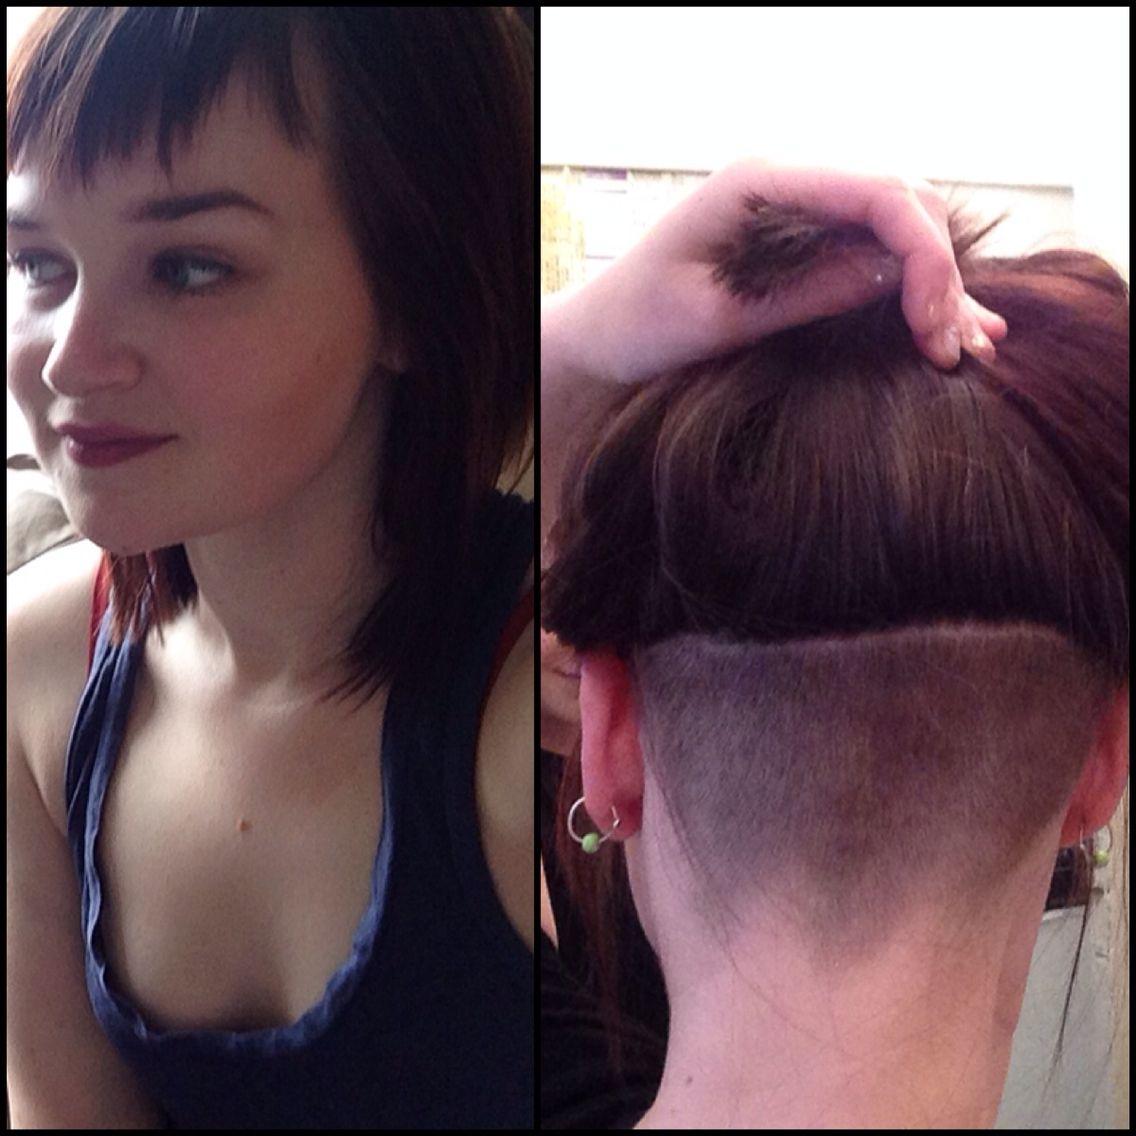 Haircut short bangs shaved nape shornnape nape undercut haircut short bangs shaved nape shornnape nape undercut girls with shaved buycottarizona Image collections